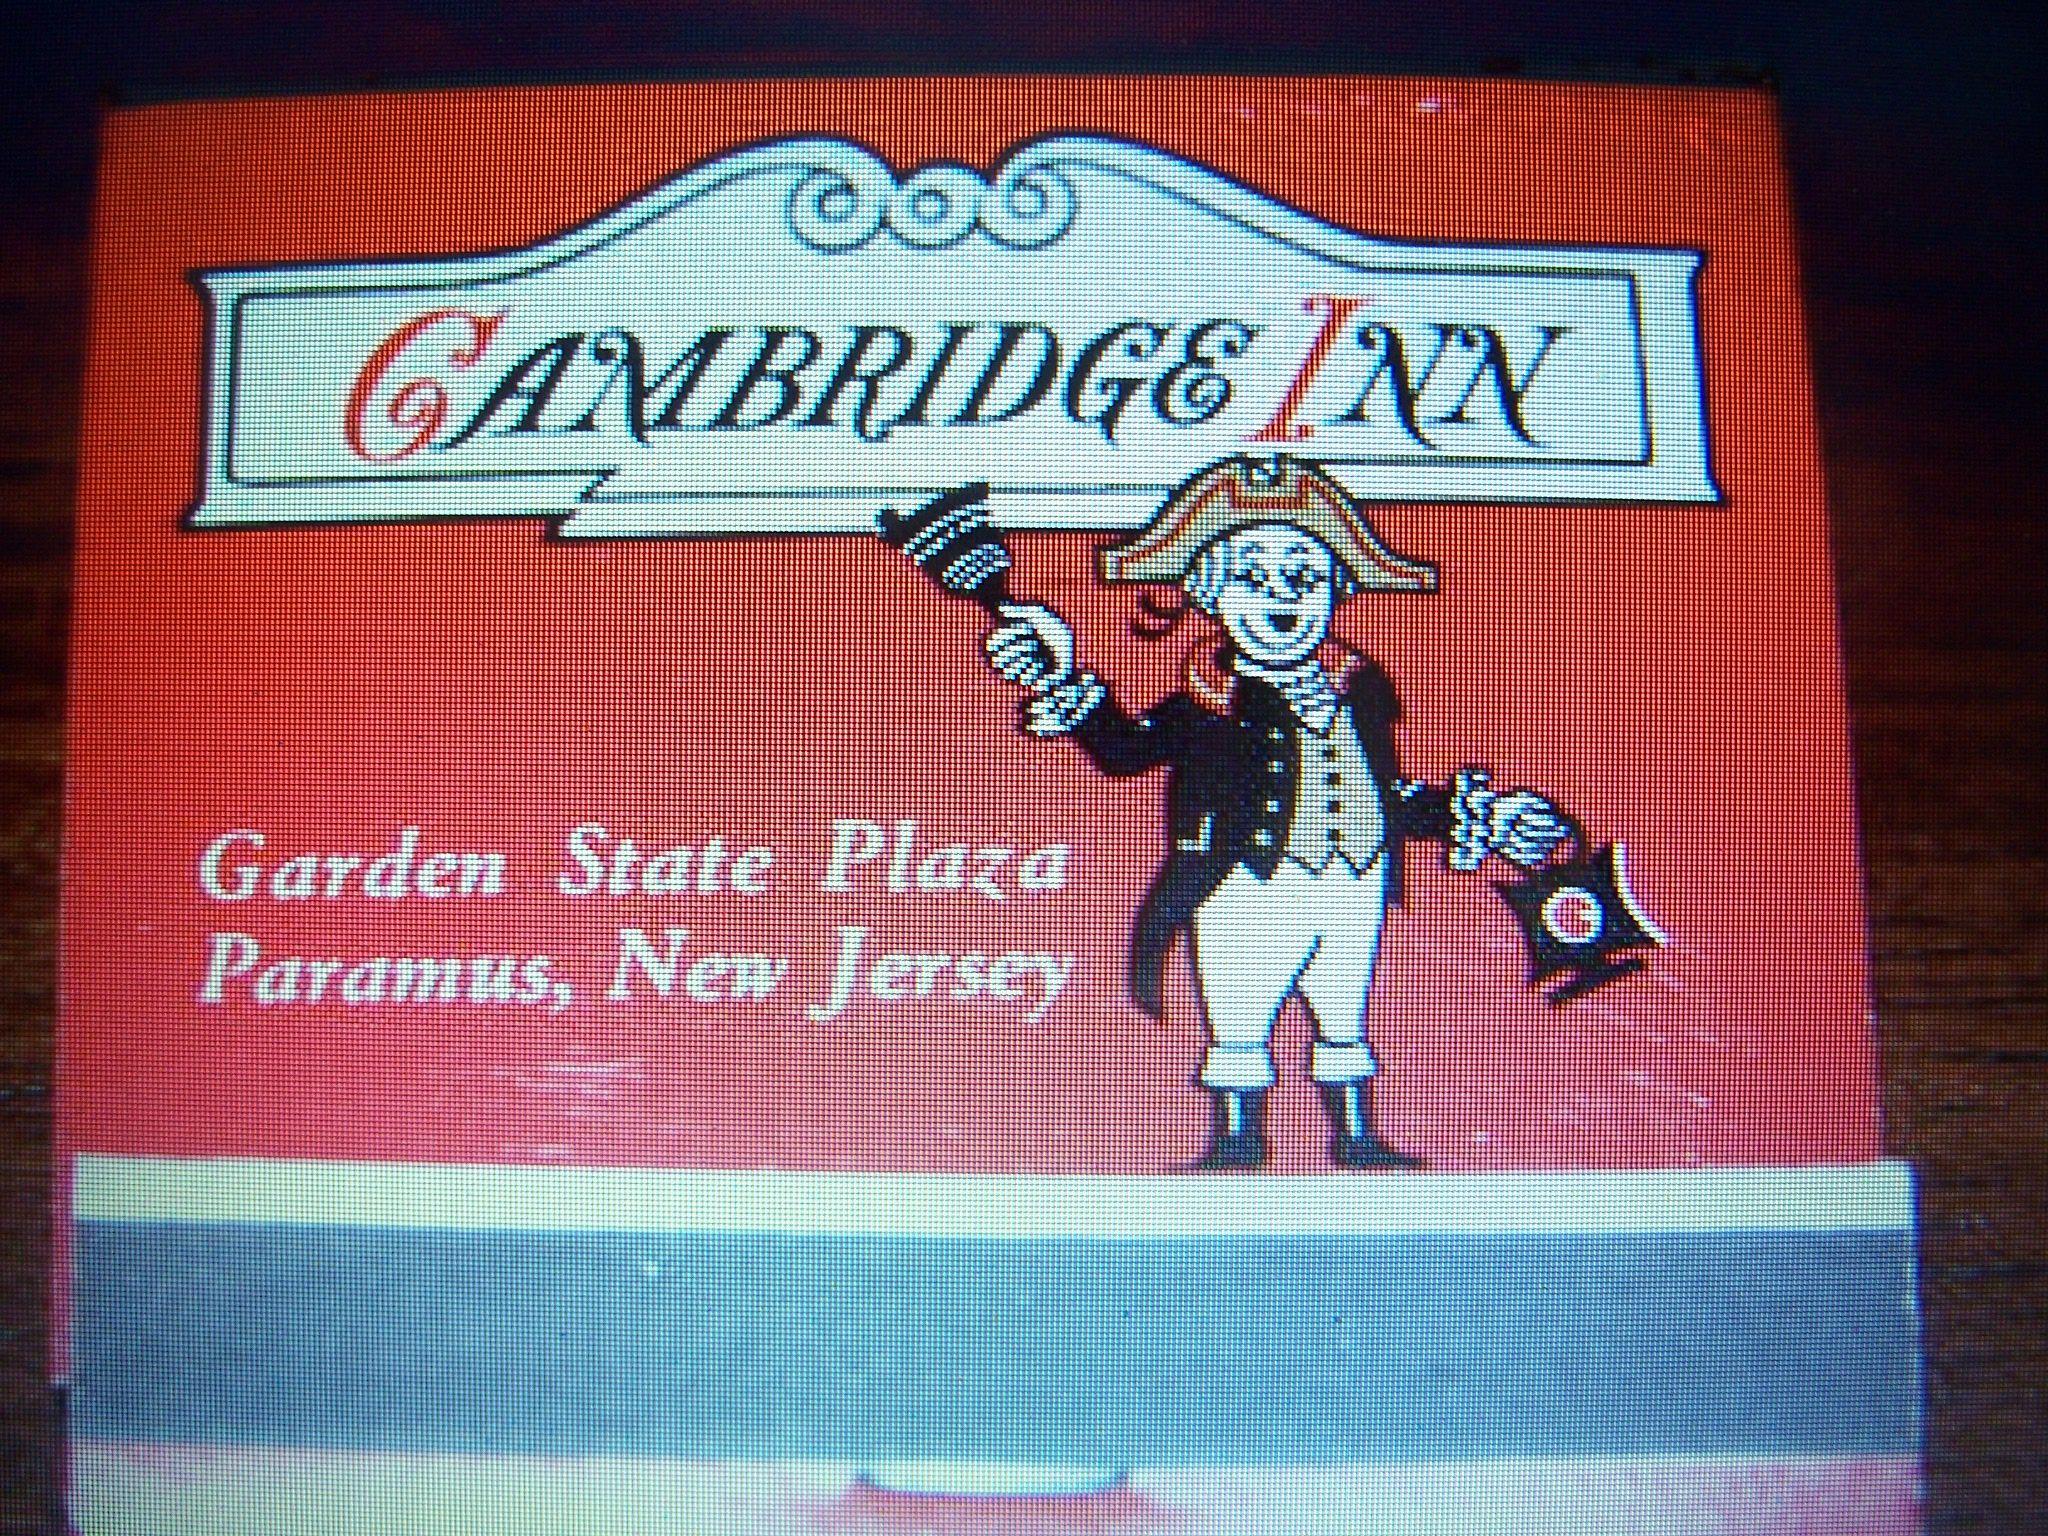 The cambridge inn at the garden state plaza paramus 1960 39 s vintage restaurants bergen for Restaurants near garden state plaza